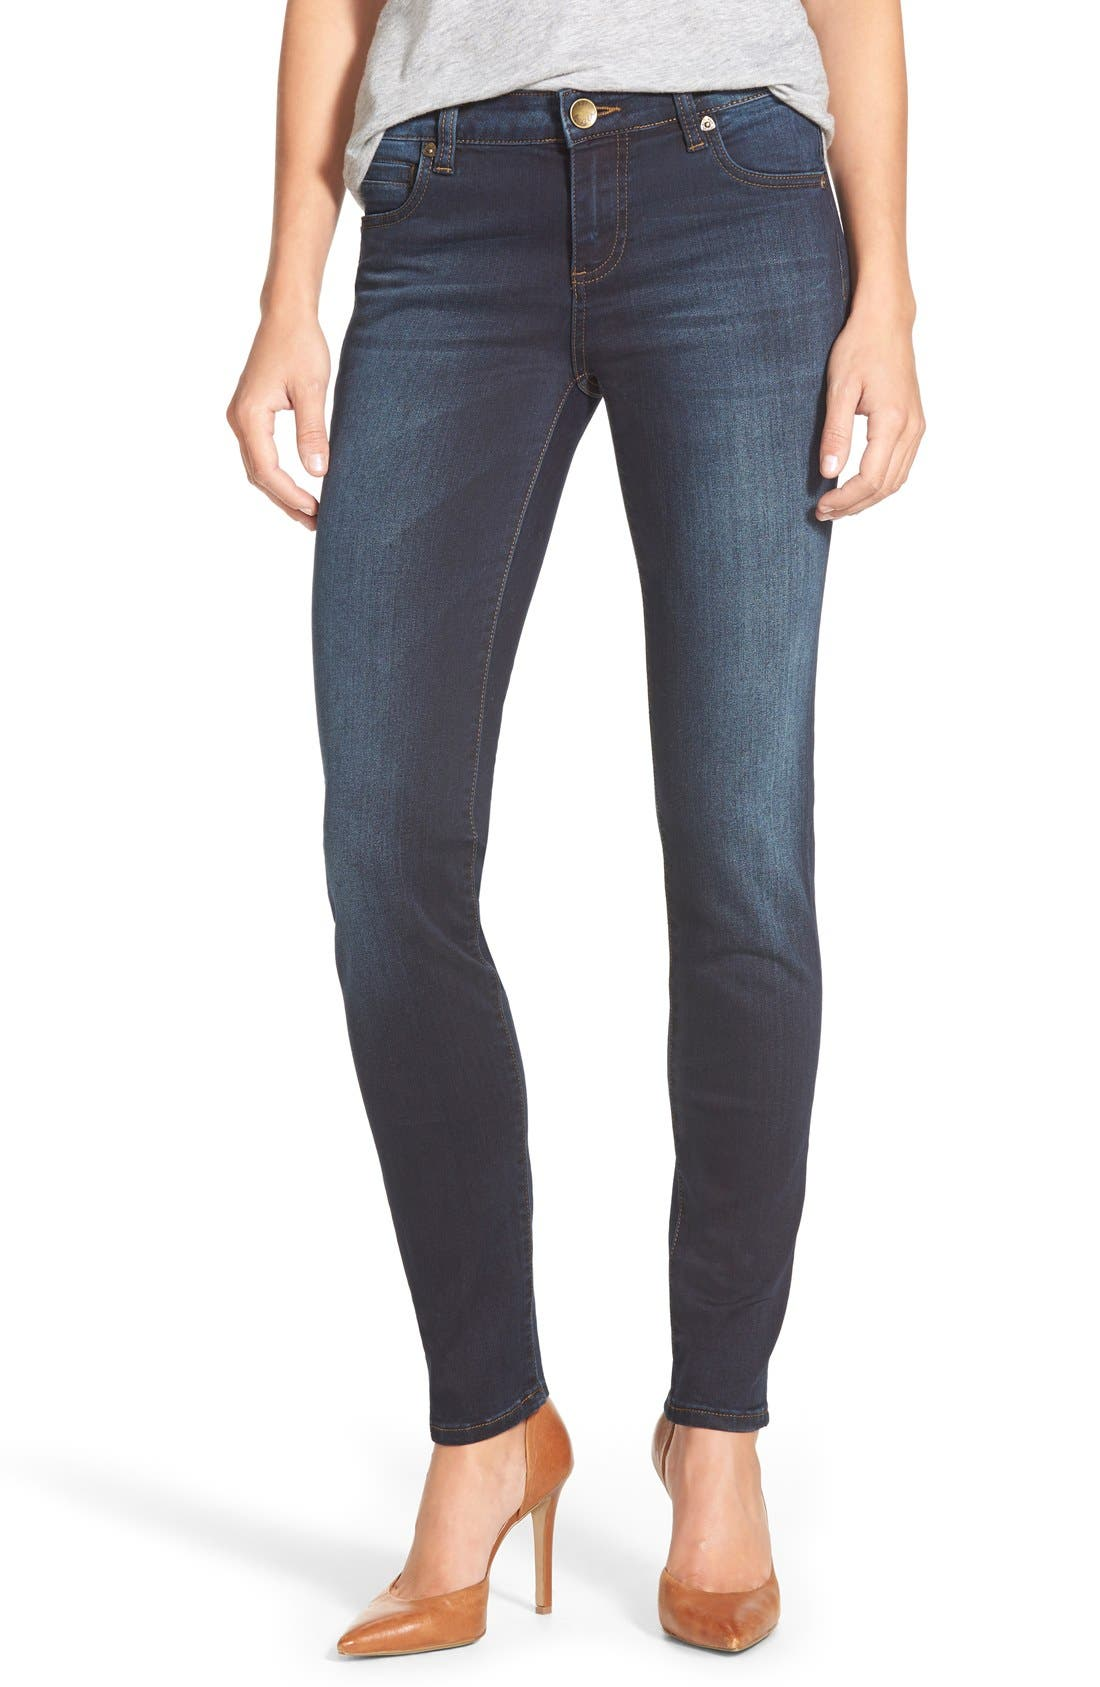 KUT from the Kloth 'Diana' Stretch Skinny Jeans (Breezy) (Regular & Petite)